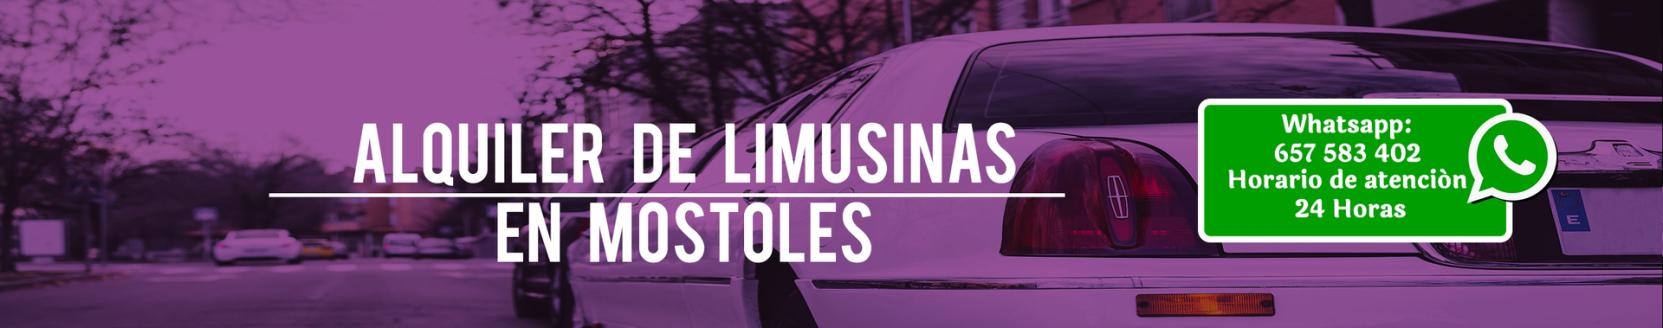 oferta alquiler de limusinas móstoles